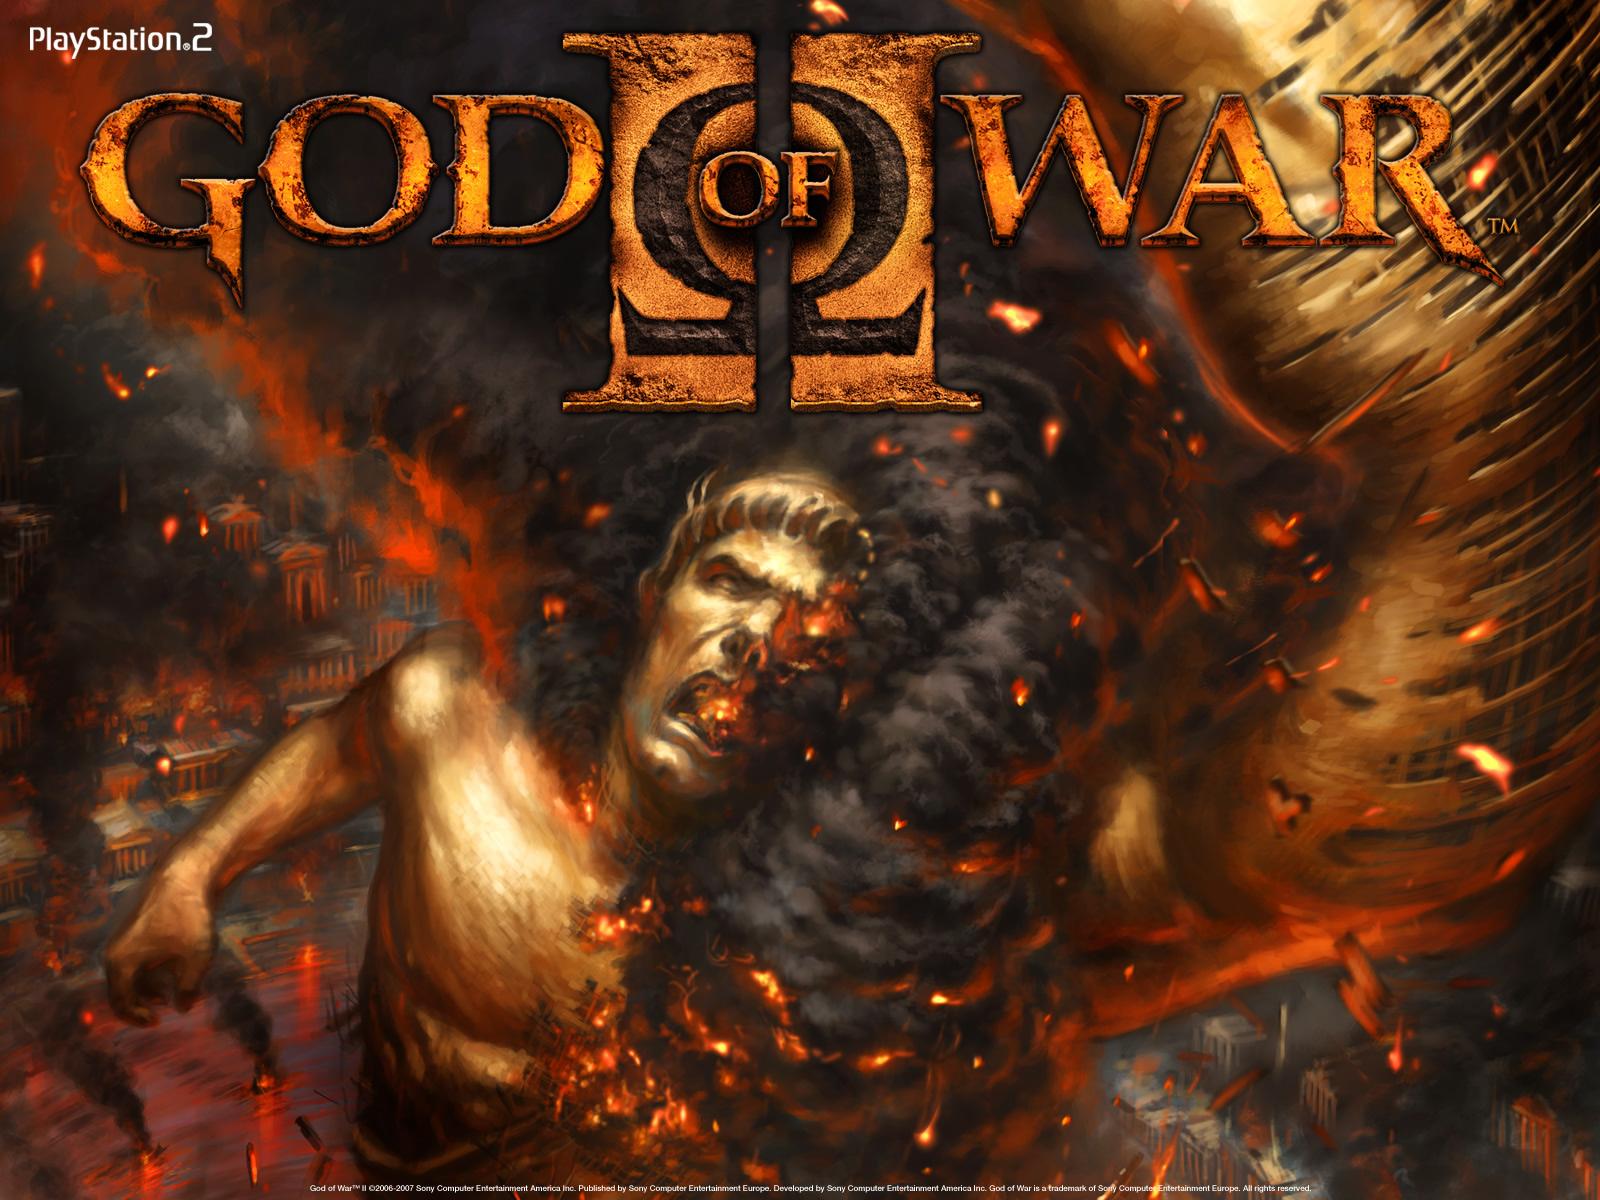 god-of-war-2-wallpaper-in-flames